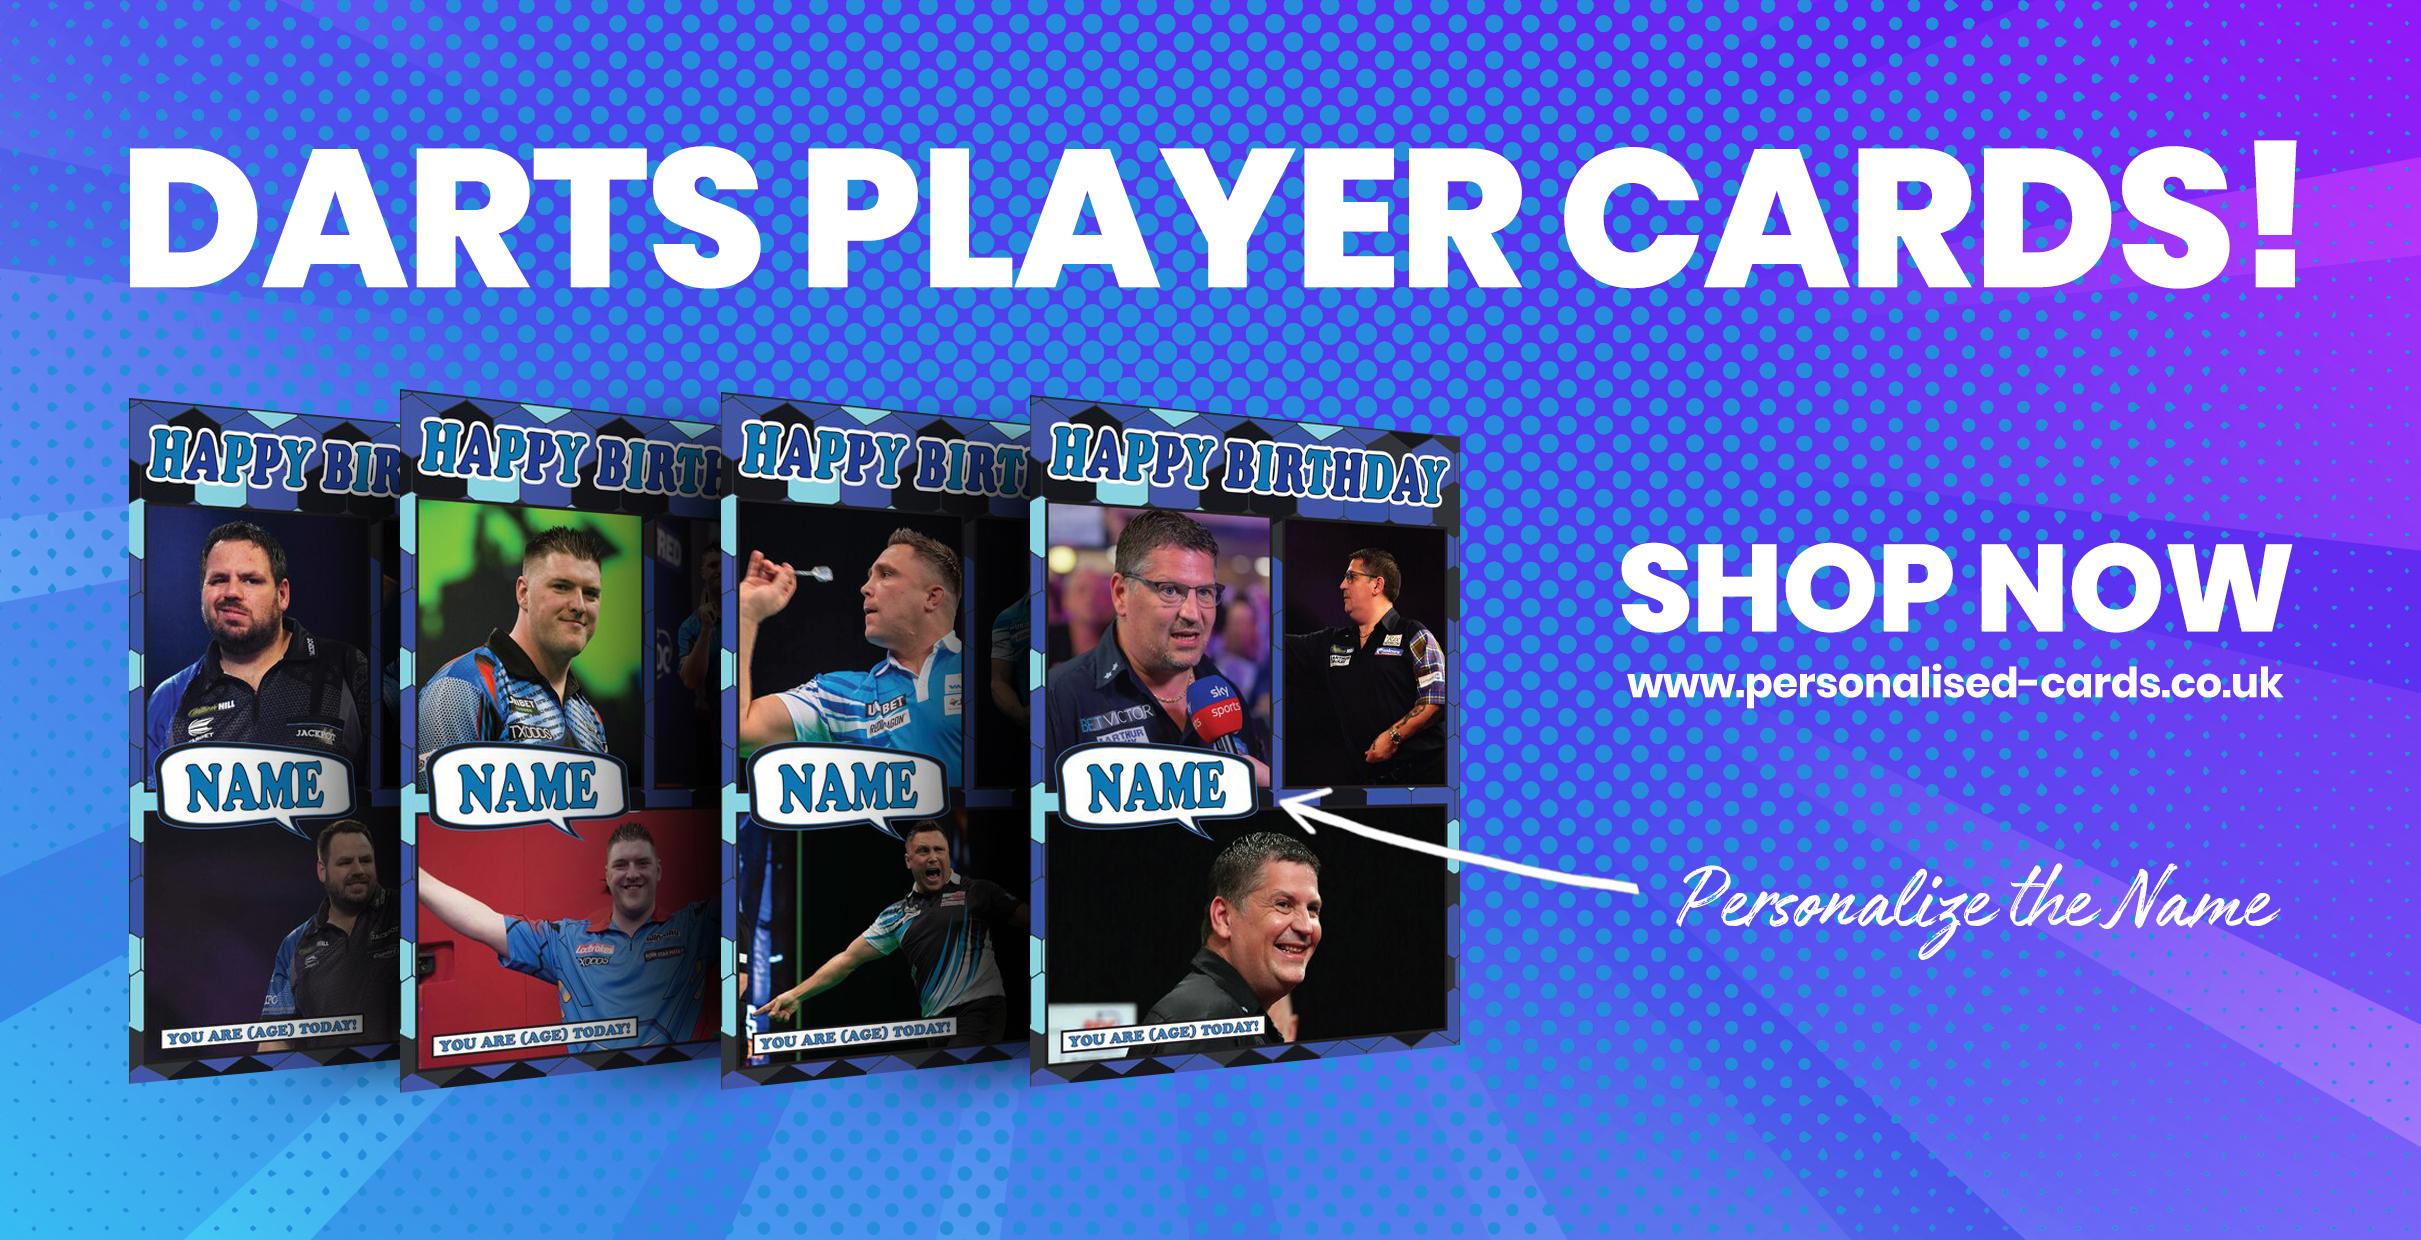 darts-player-cards.jpg